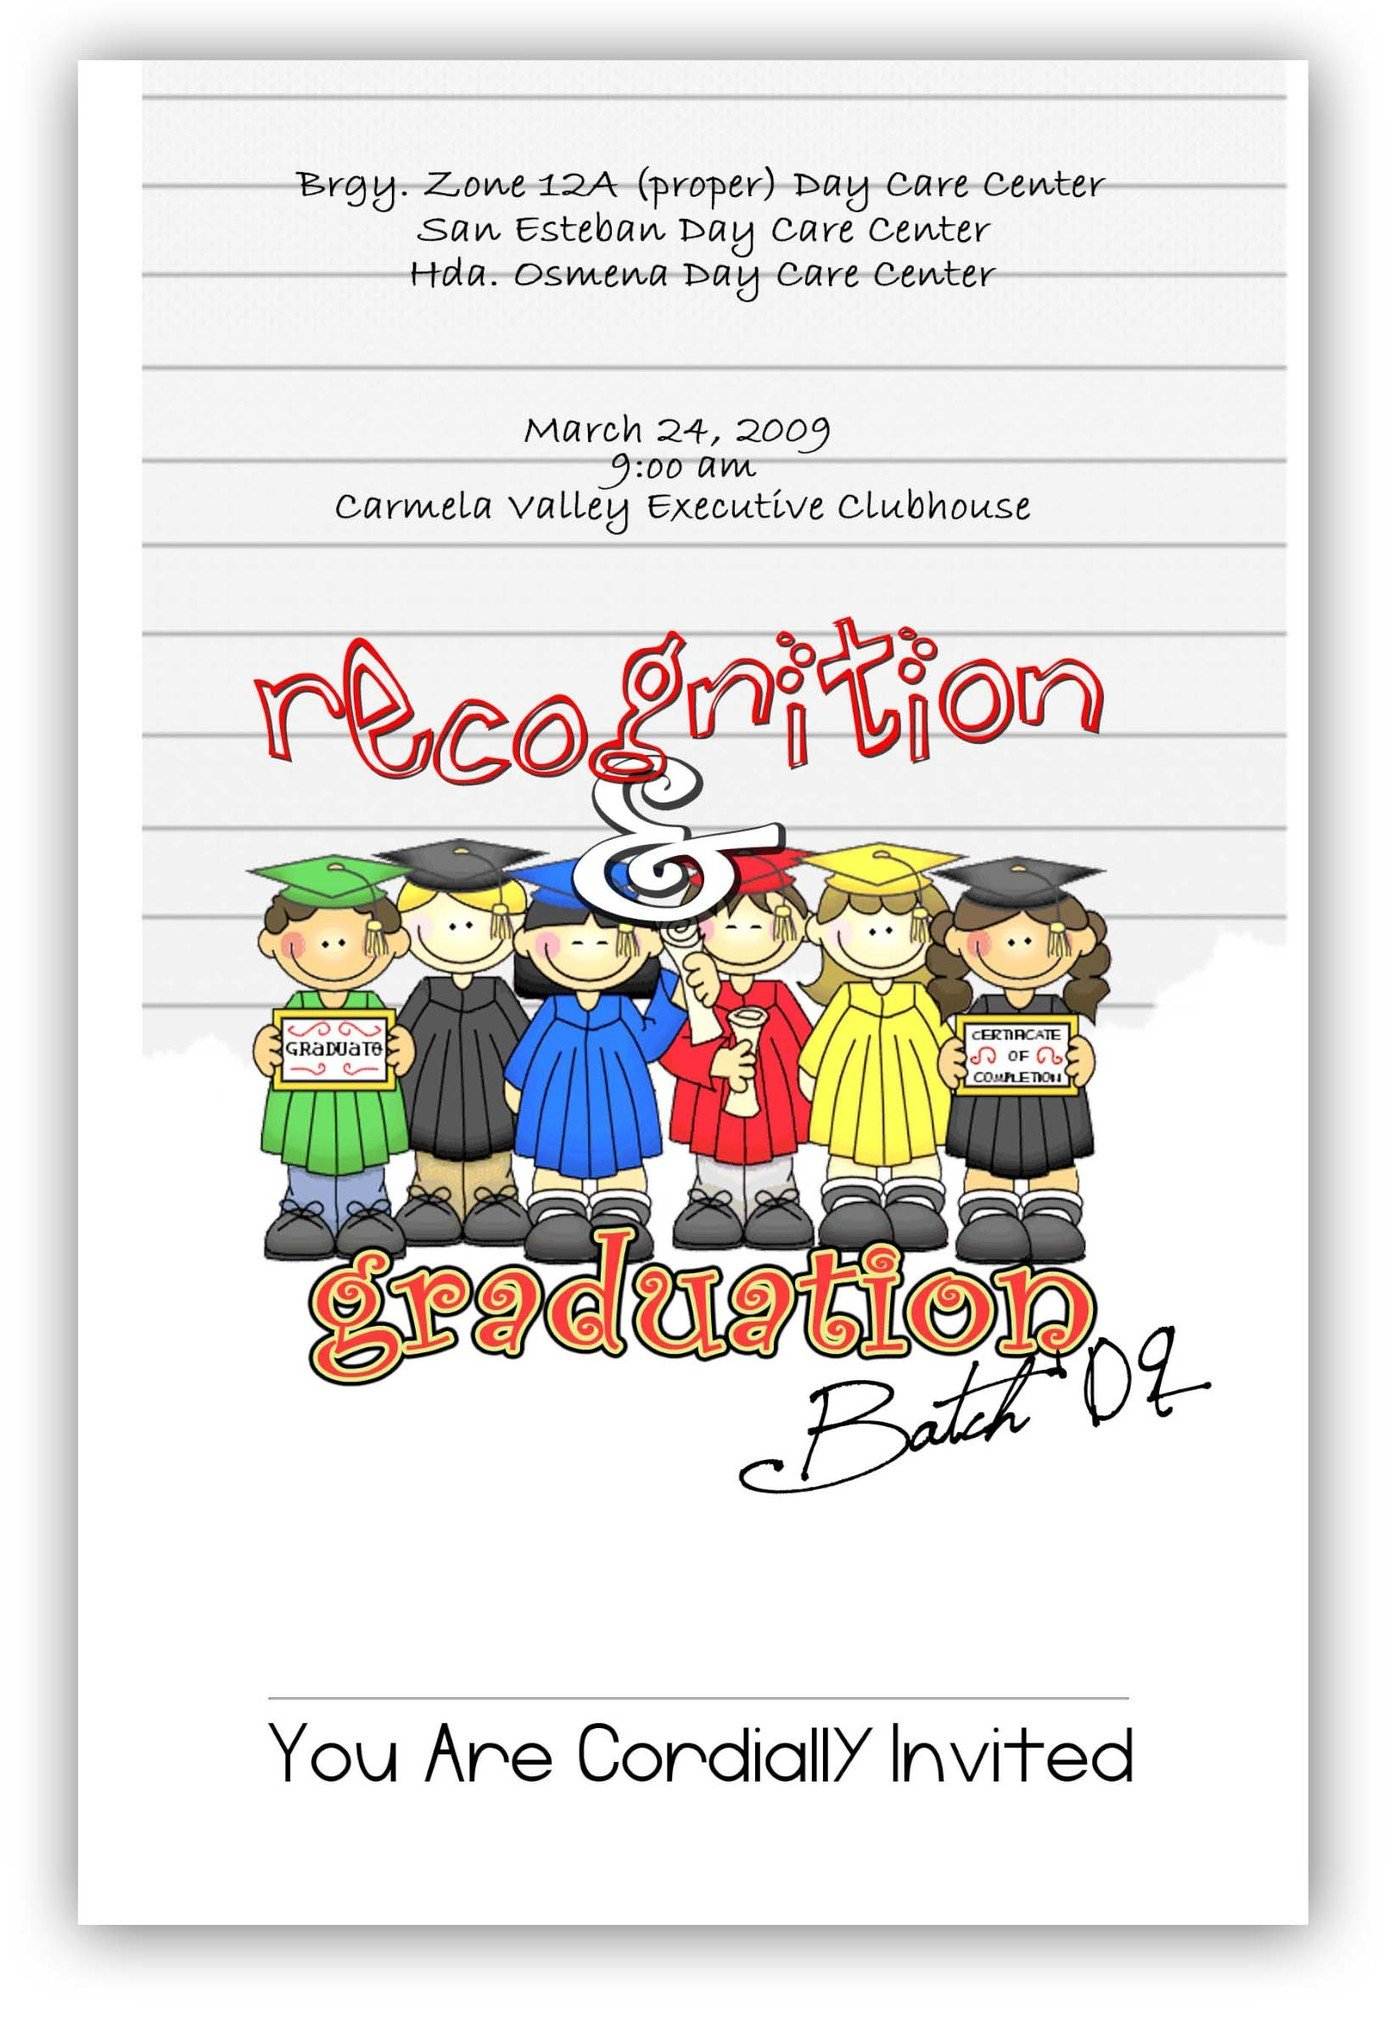 print designs by revo tribaco at coroflot com